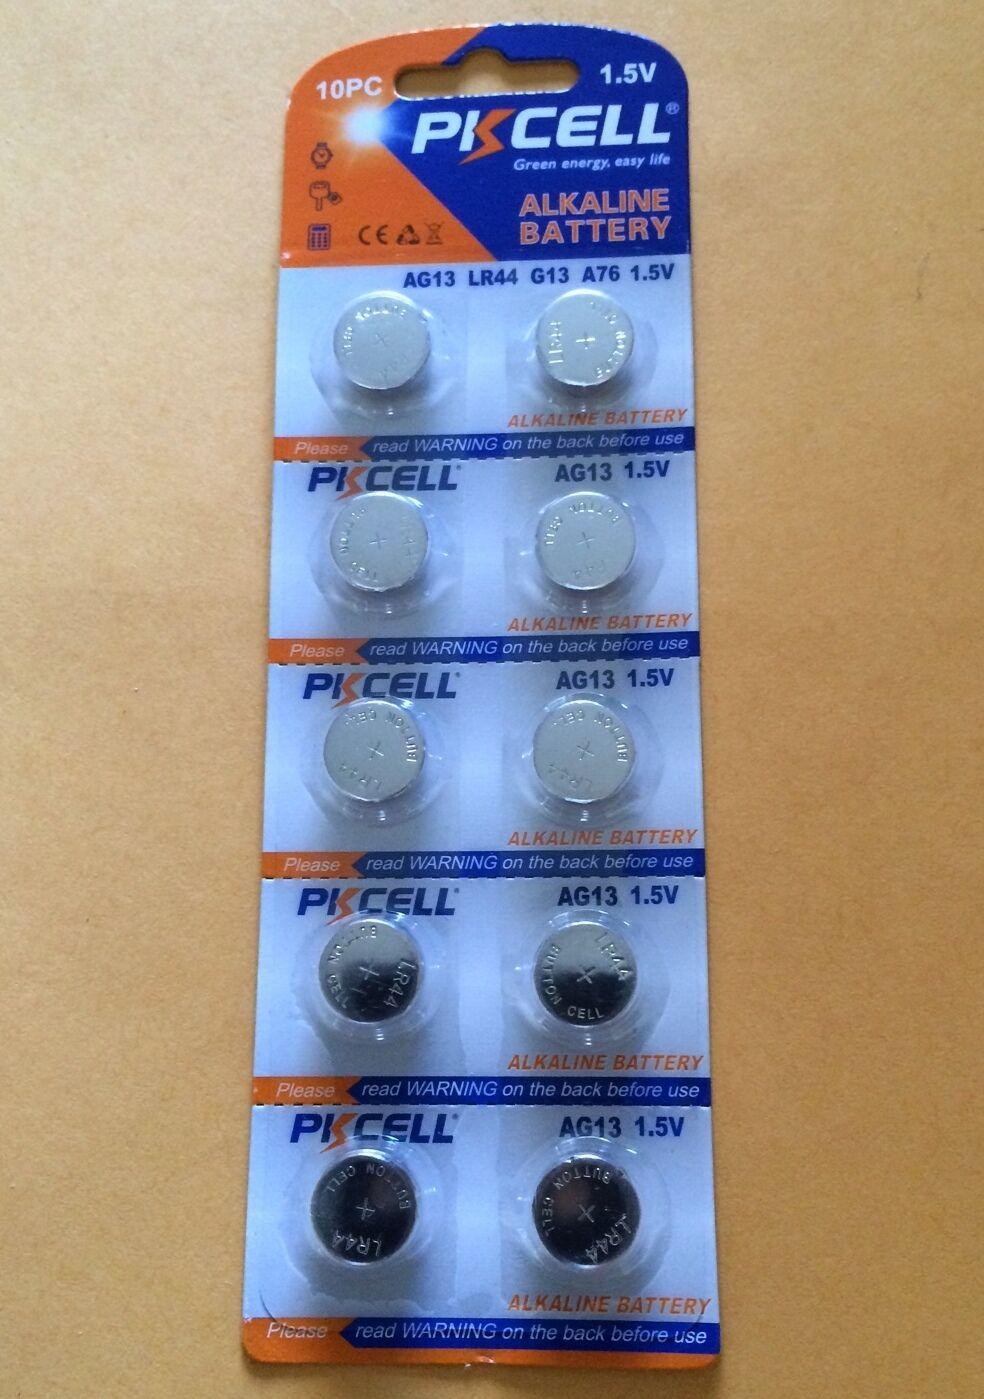 10 Pieces AG 13 LR44 G13 A76 1.5 volt Button Cell Battery 1 Pack Fresh Alkaline